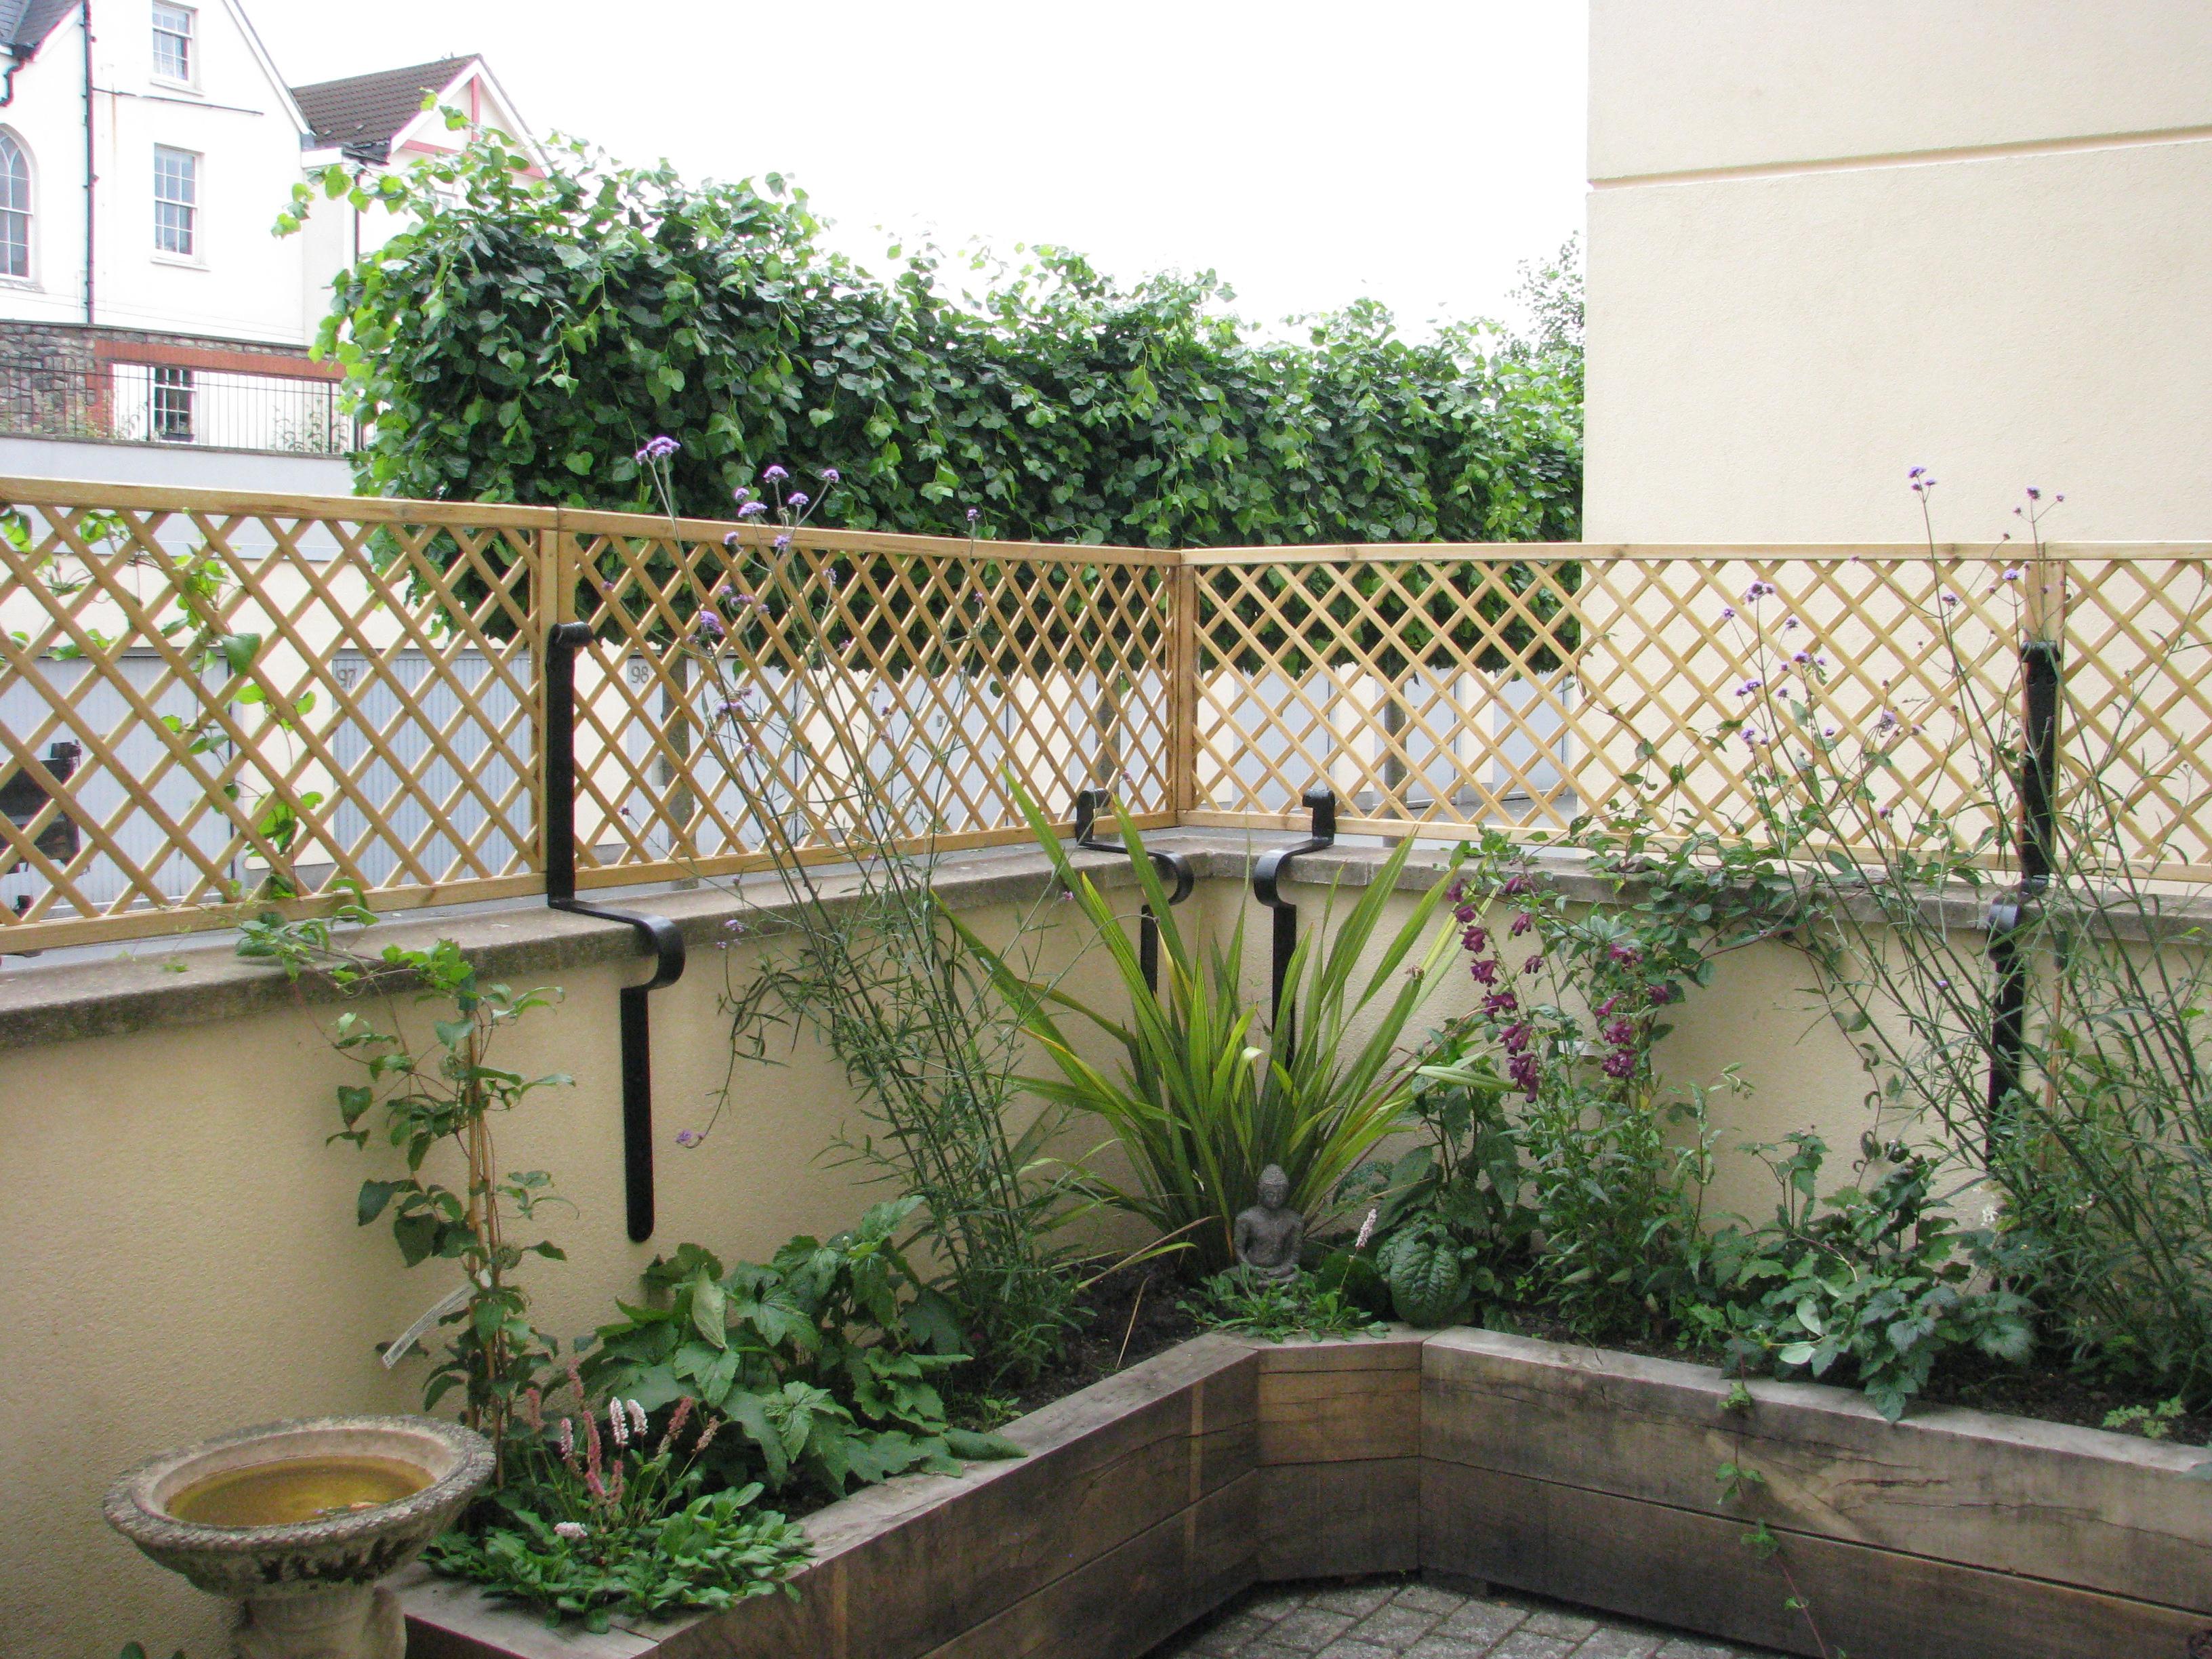 Deorative garden trellis brackets